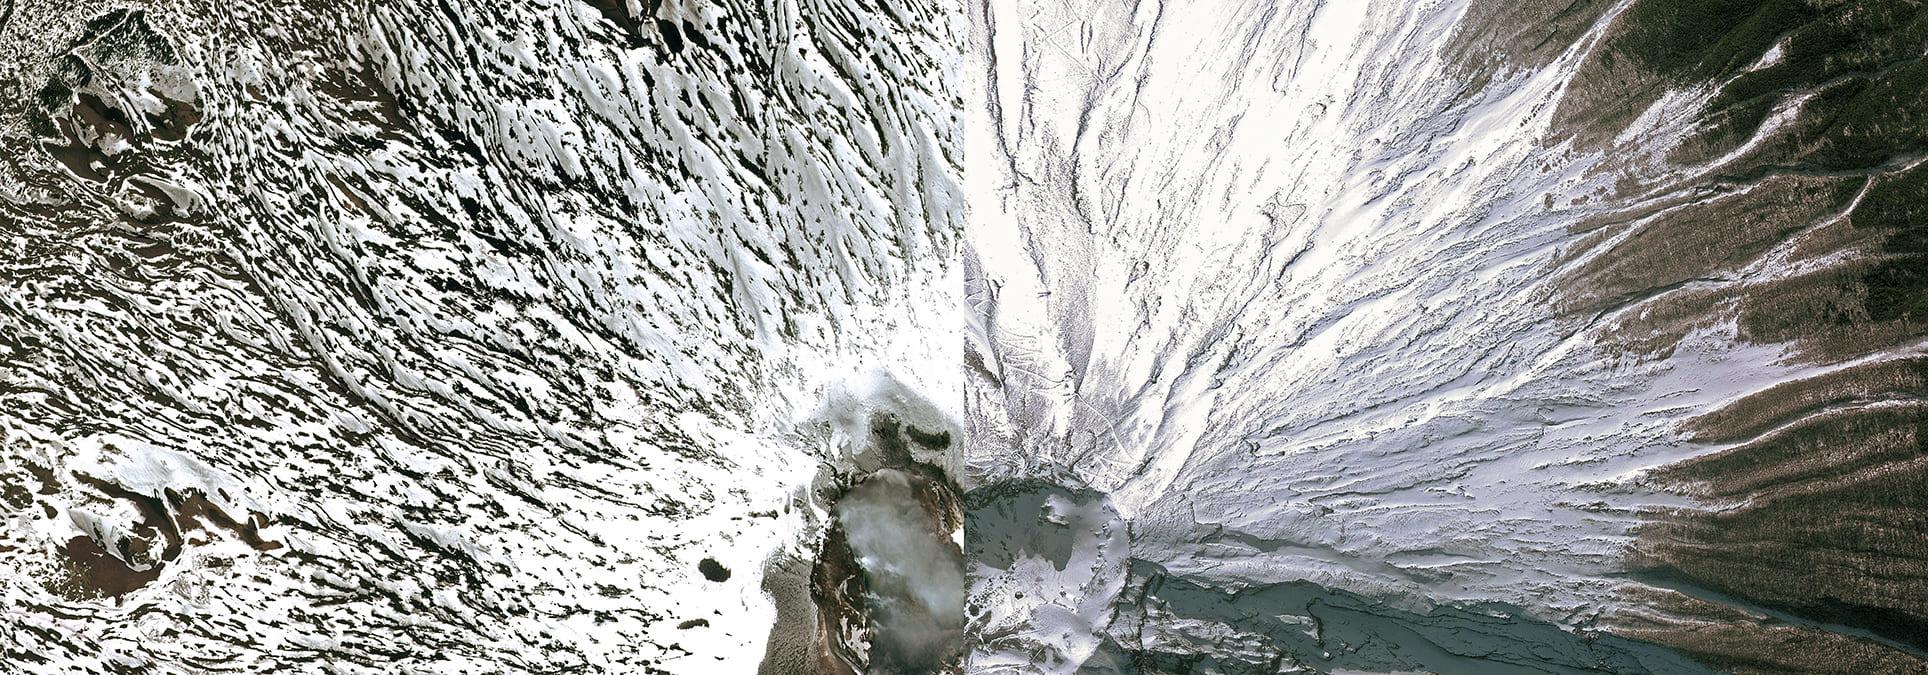 WLP 11 Etna-Fuji, 2012, cm 100×280, 1/9